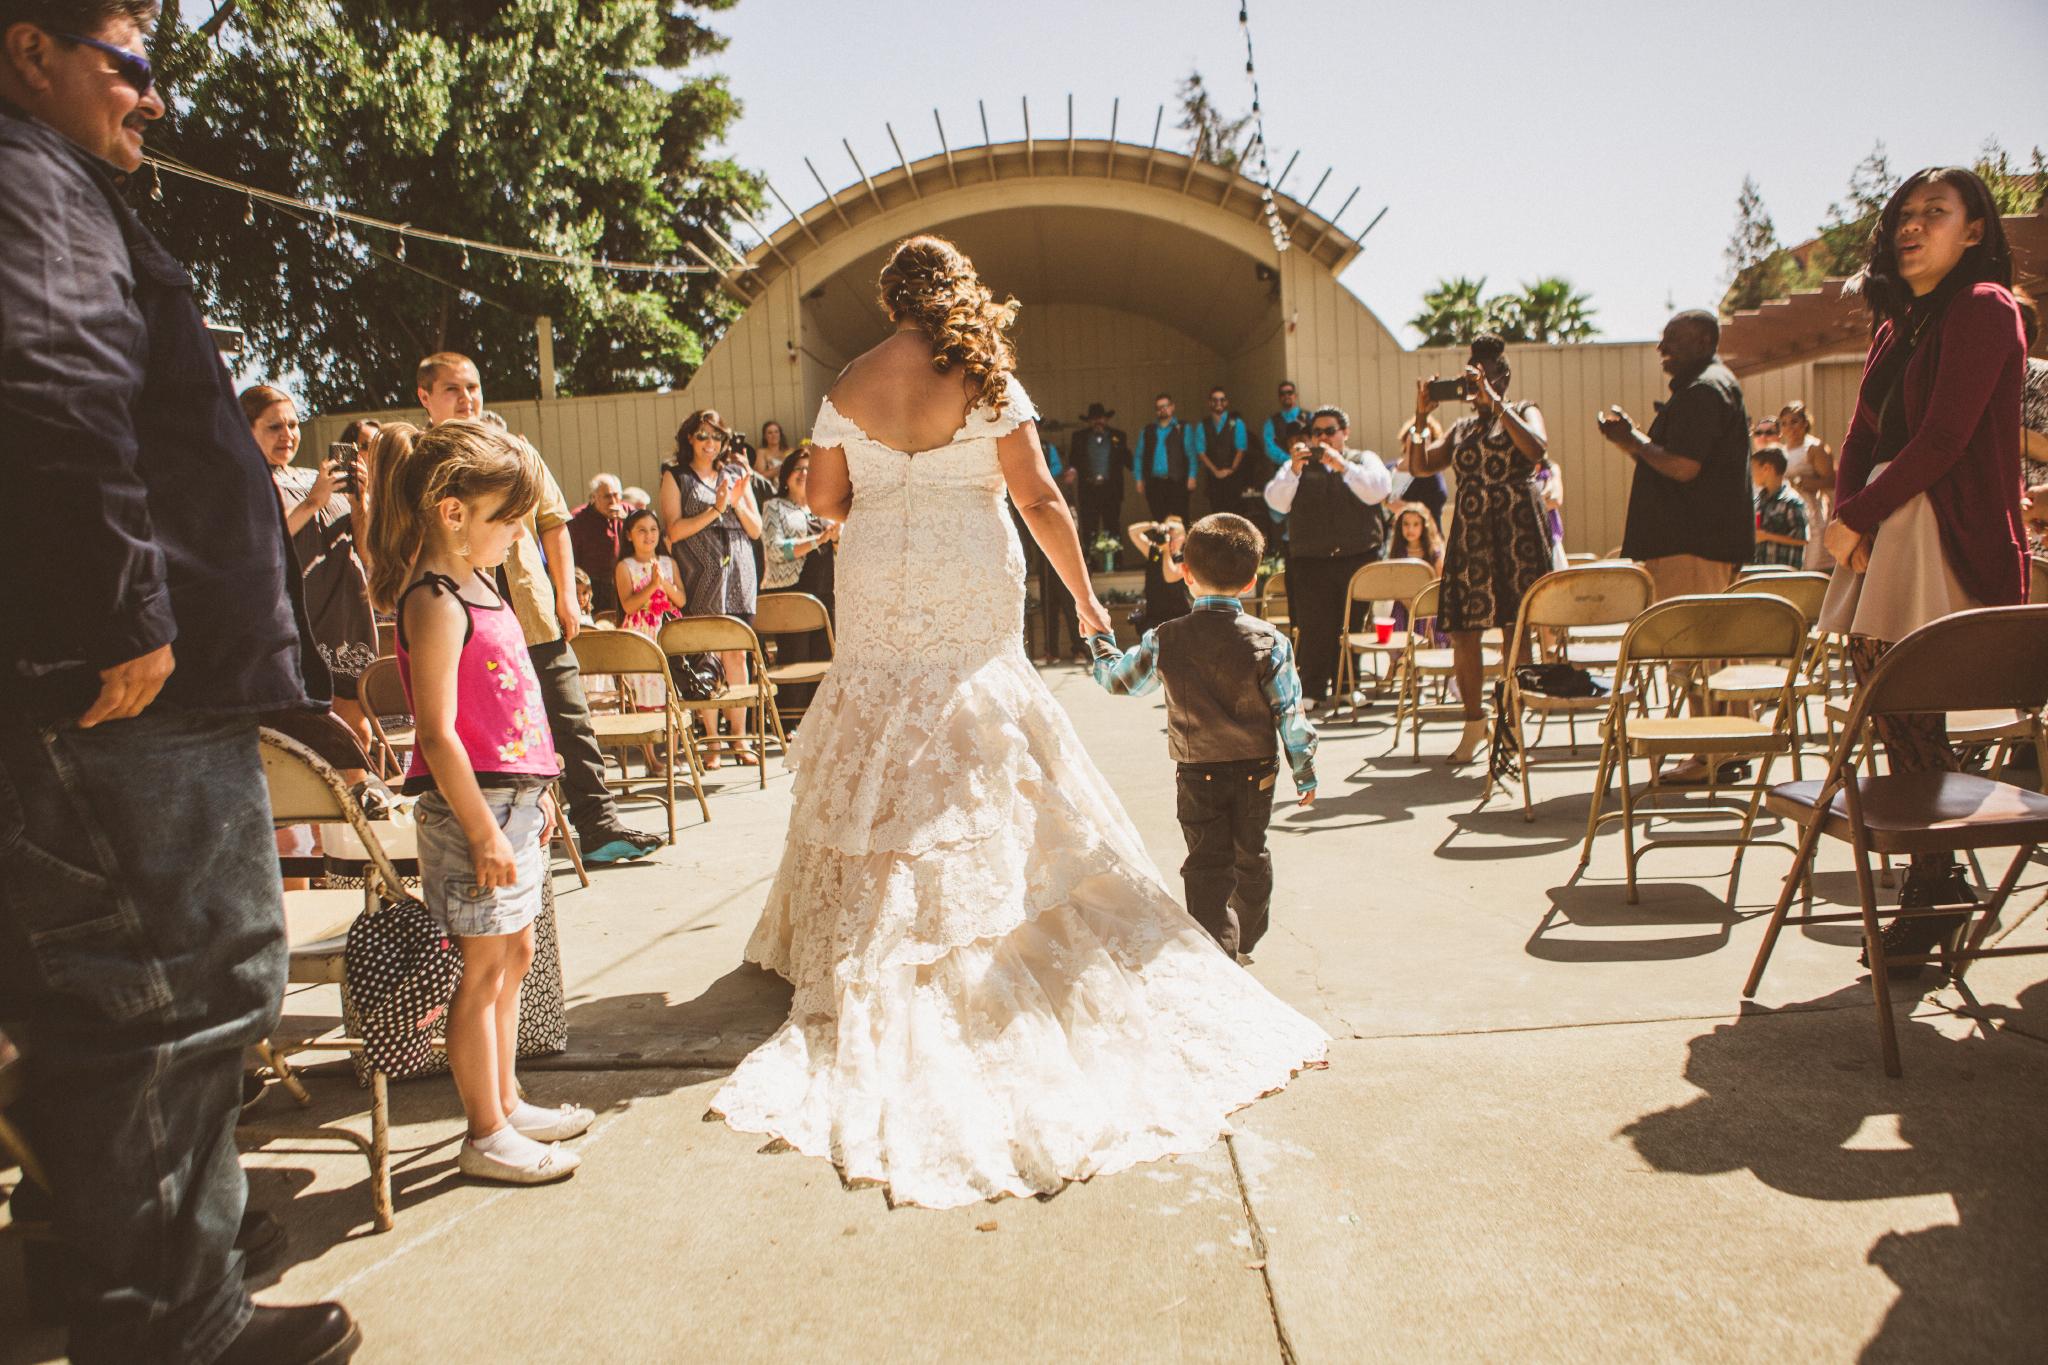 san diego wedding   photographer   bride holding child's hand walking down aisle